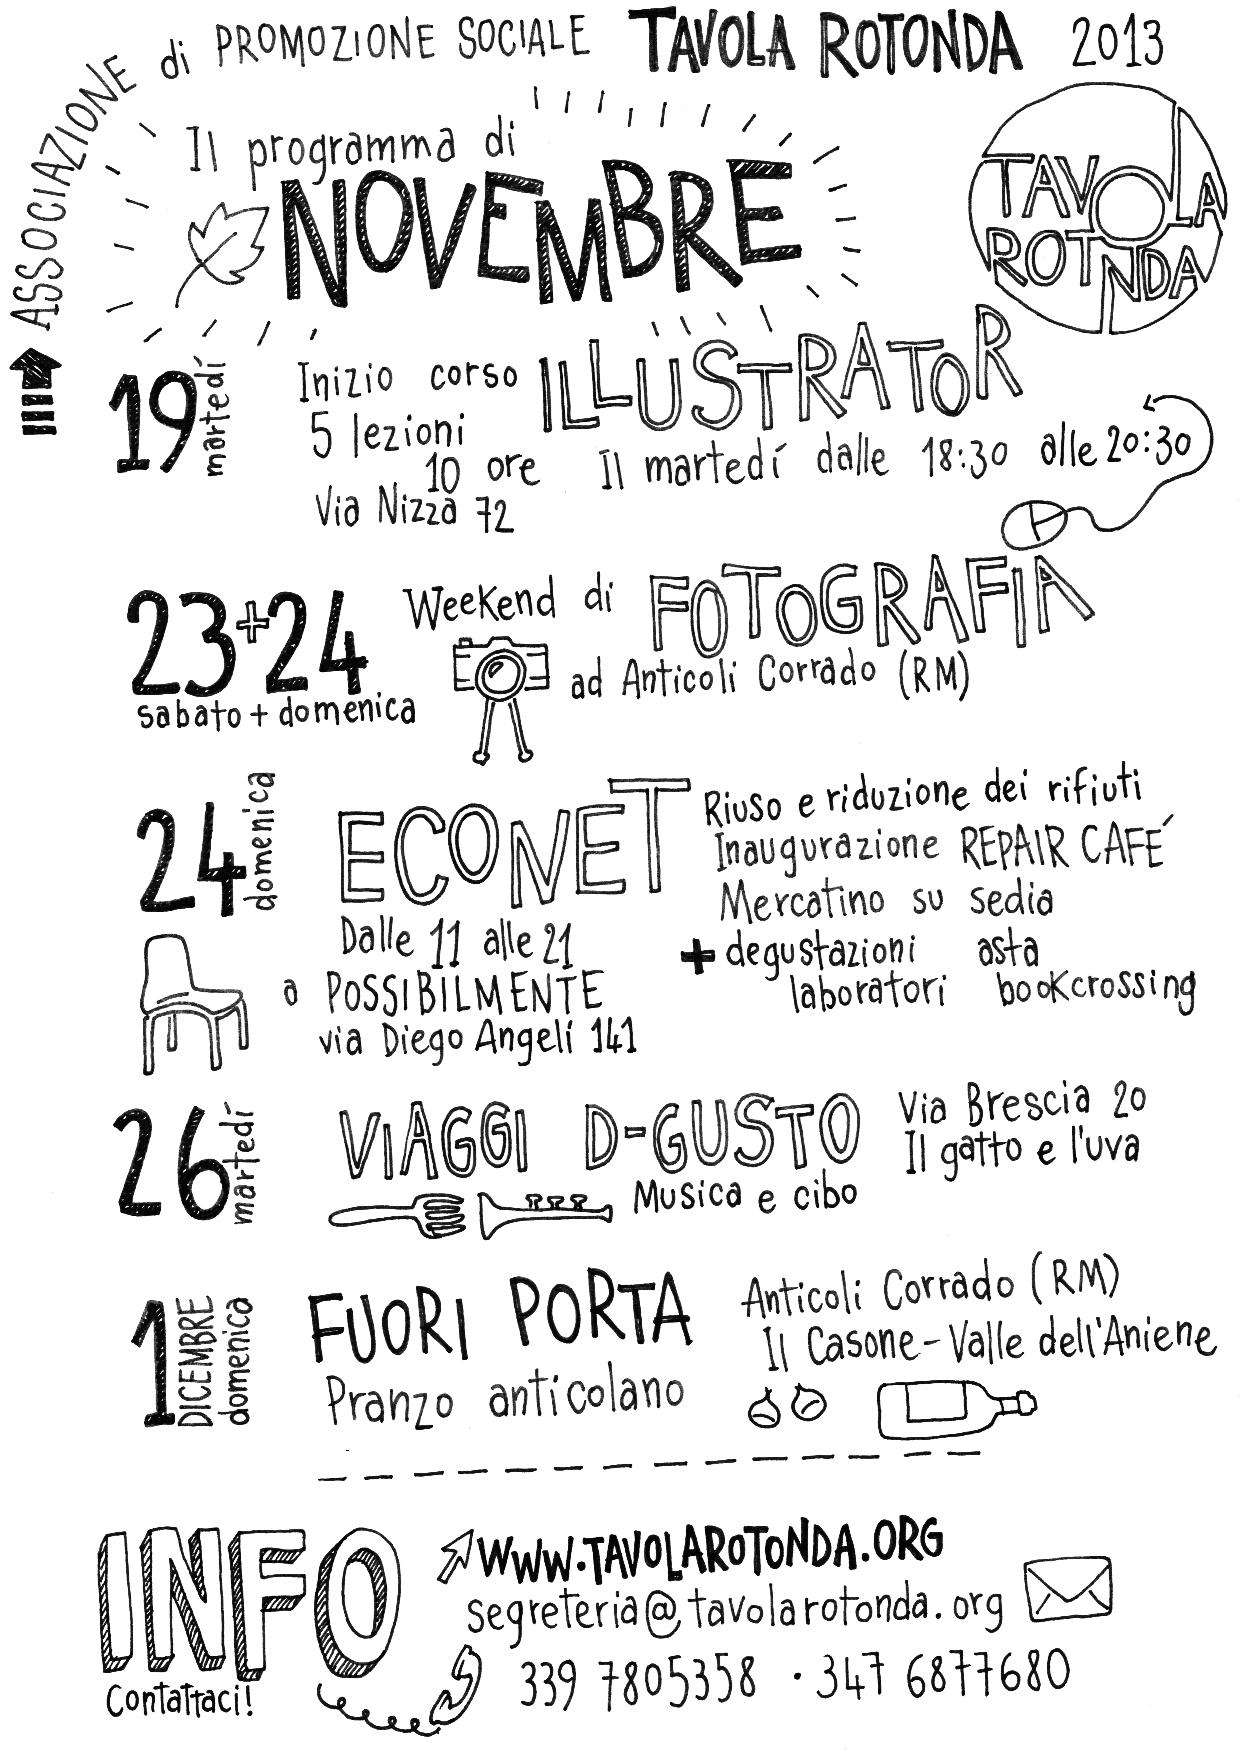 Programma novembre 2013